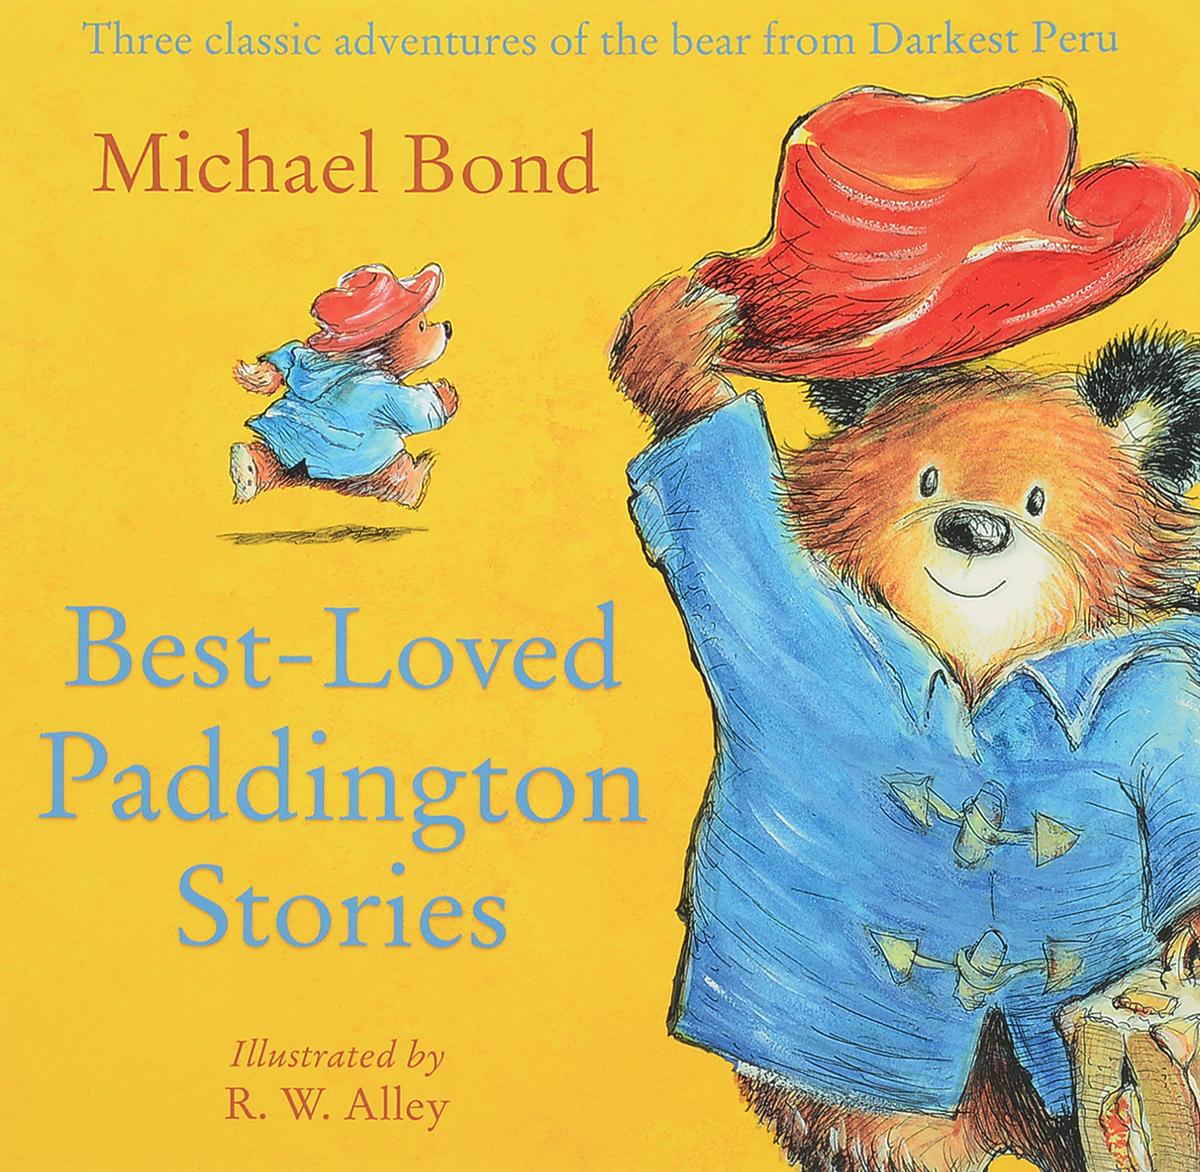 Best-loved Paddington Stories batgirl volume 1 the darkest reflection